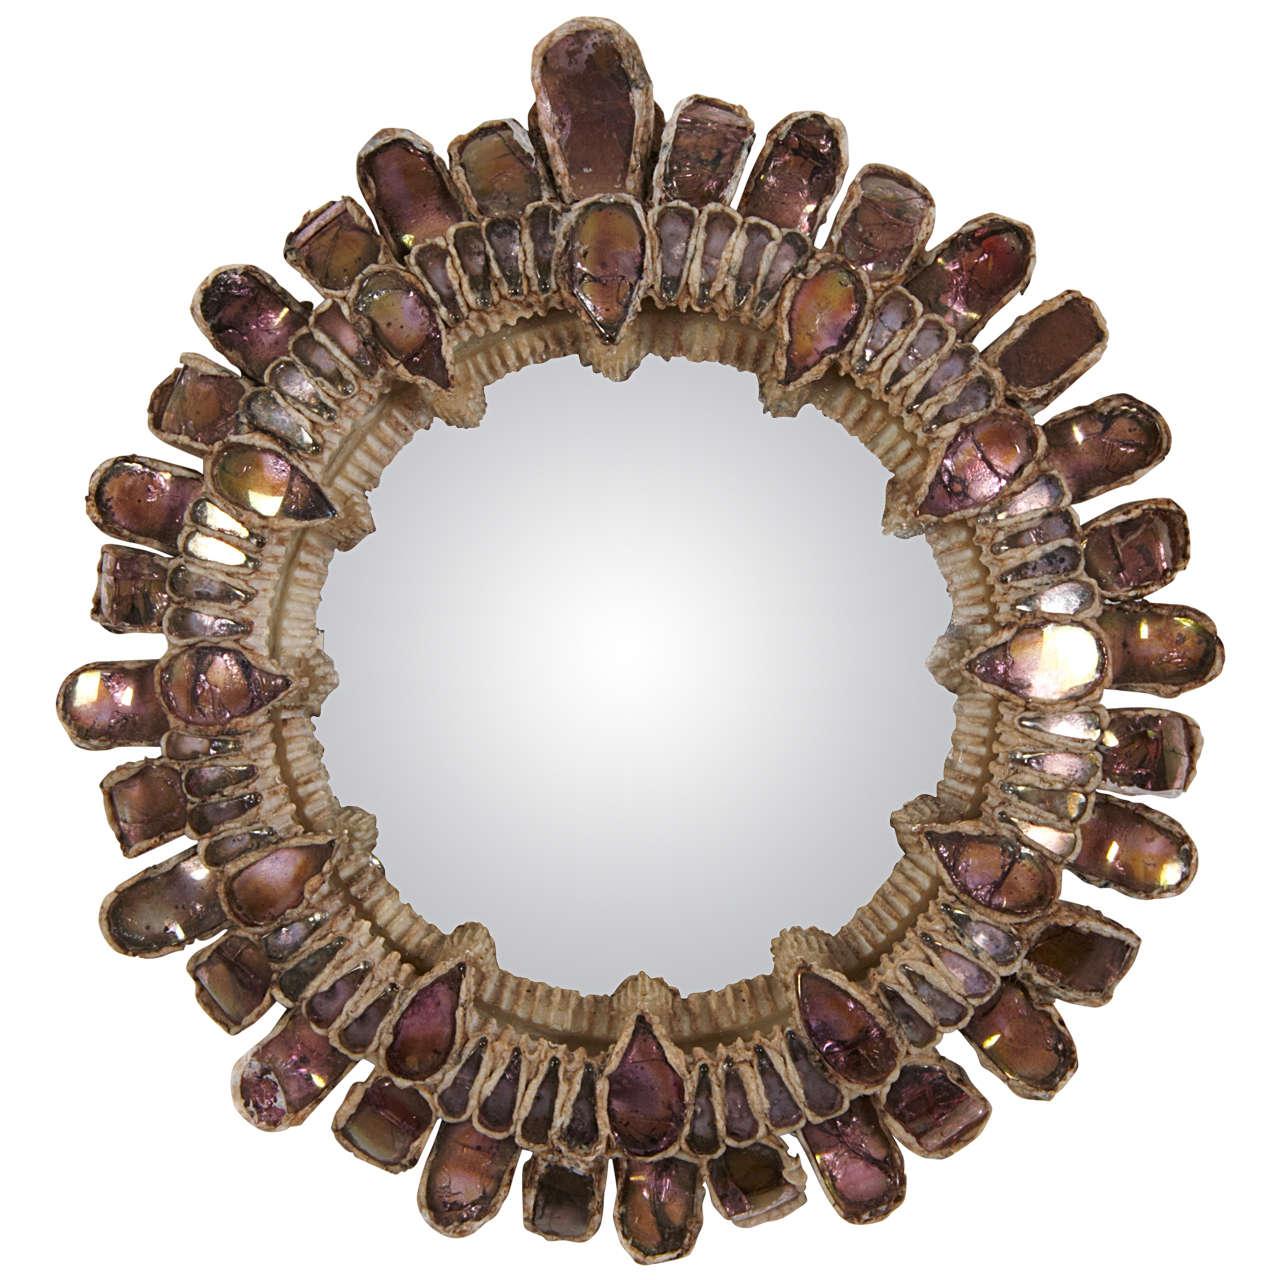 Line vautrin mirror gribiche for sale at 1stdibs for Miroir line vautrin